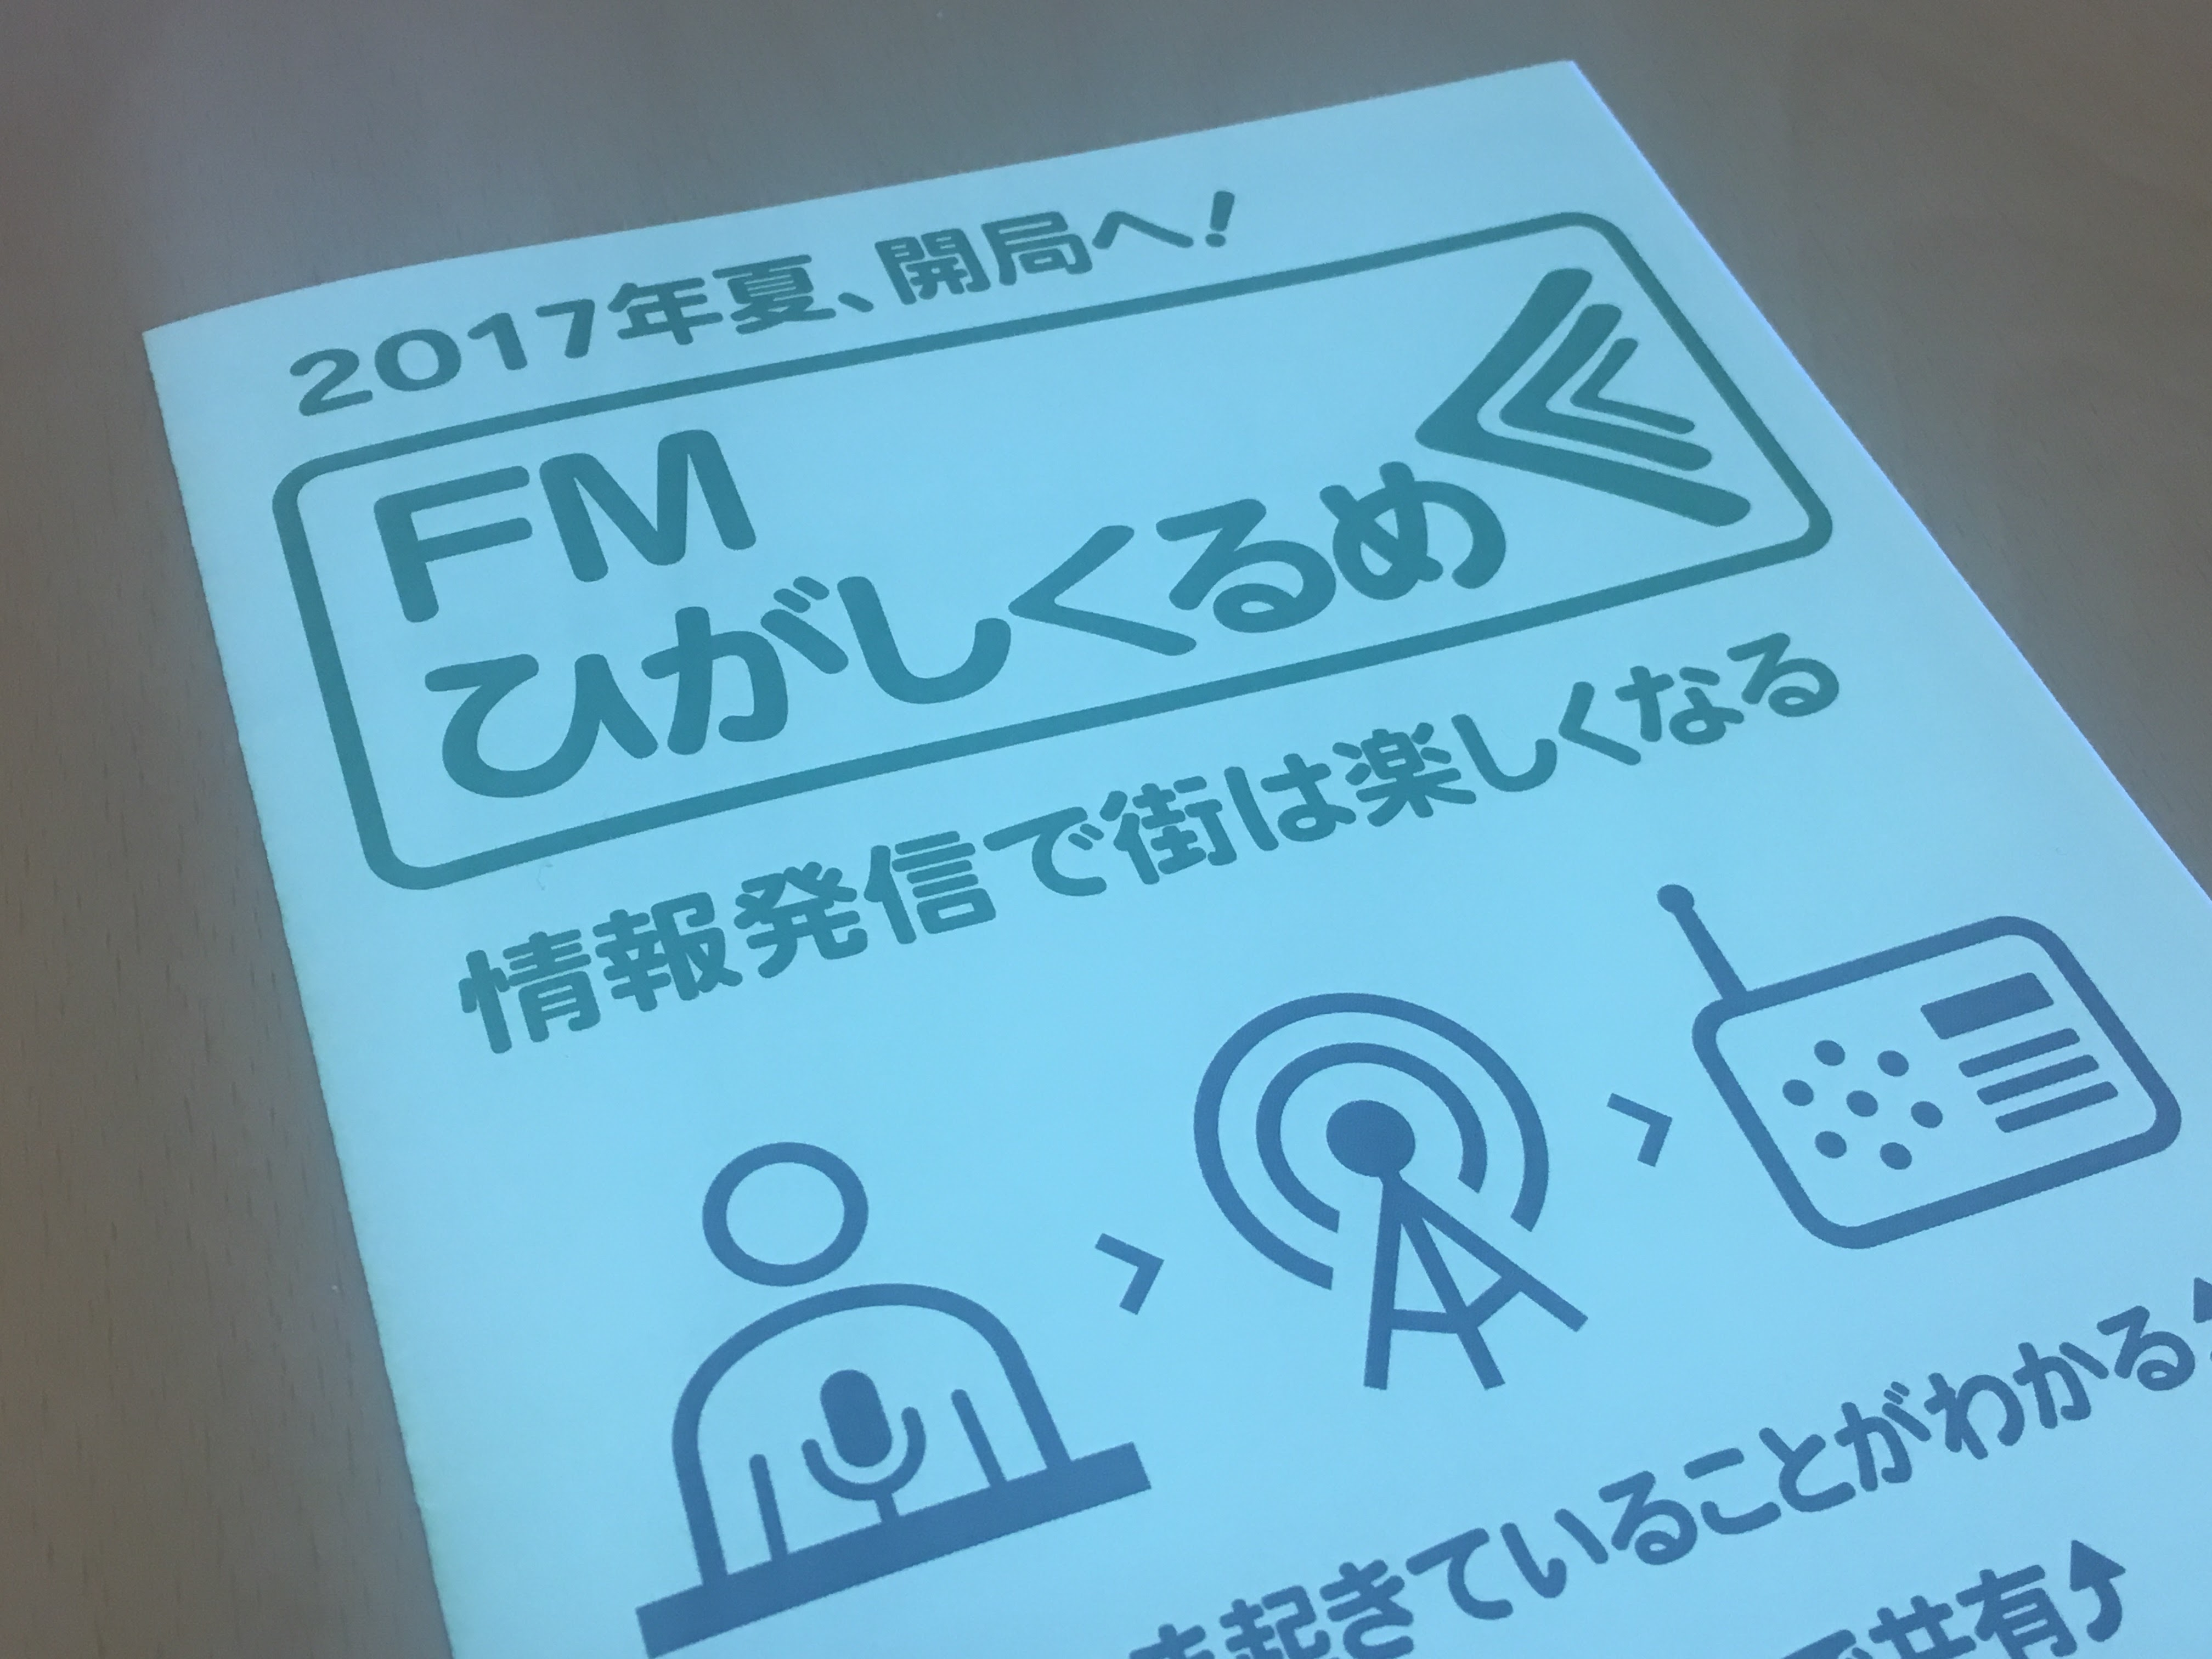 FMひがしくるめ「つっちーのスポーツパーク」収録してきました!東京マラソンを熱く楽しく語って楽しかったー。